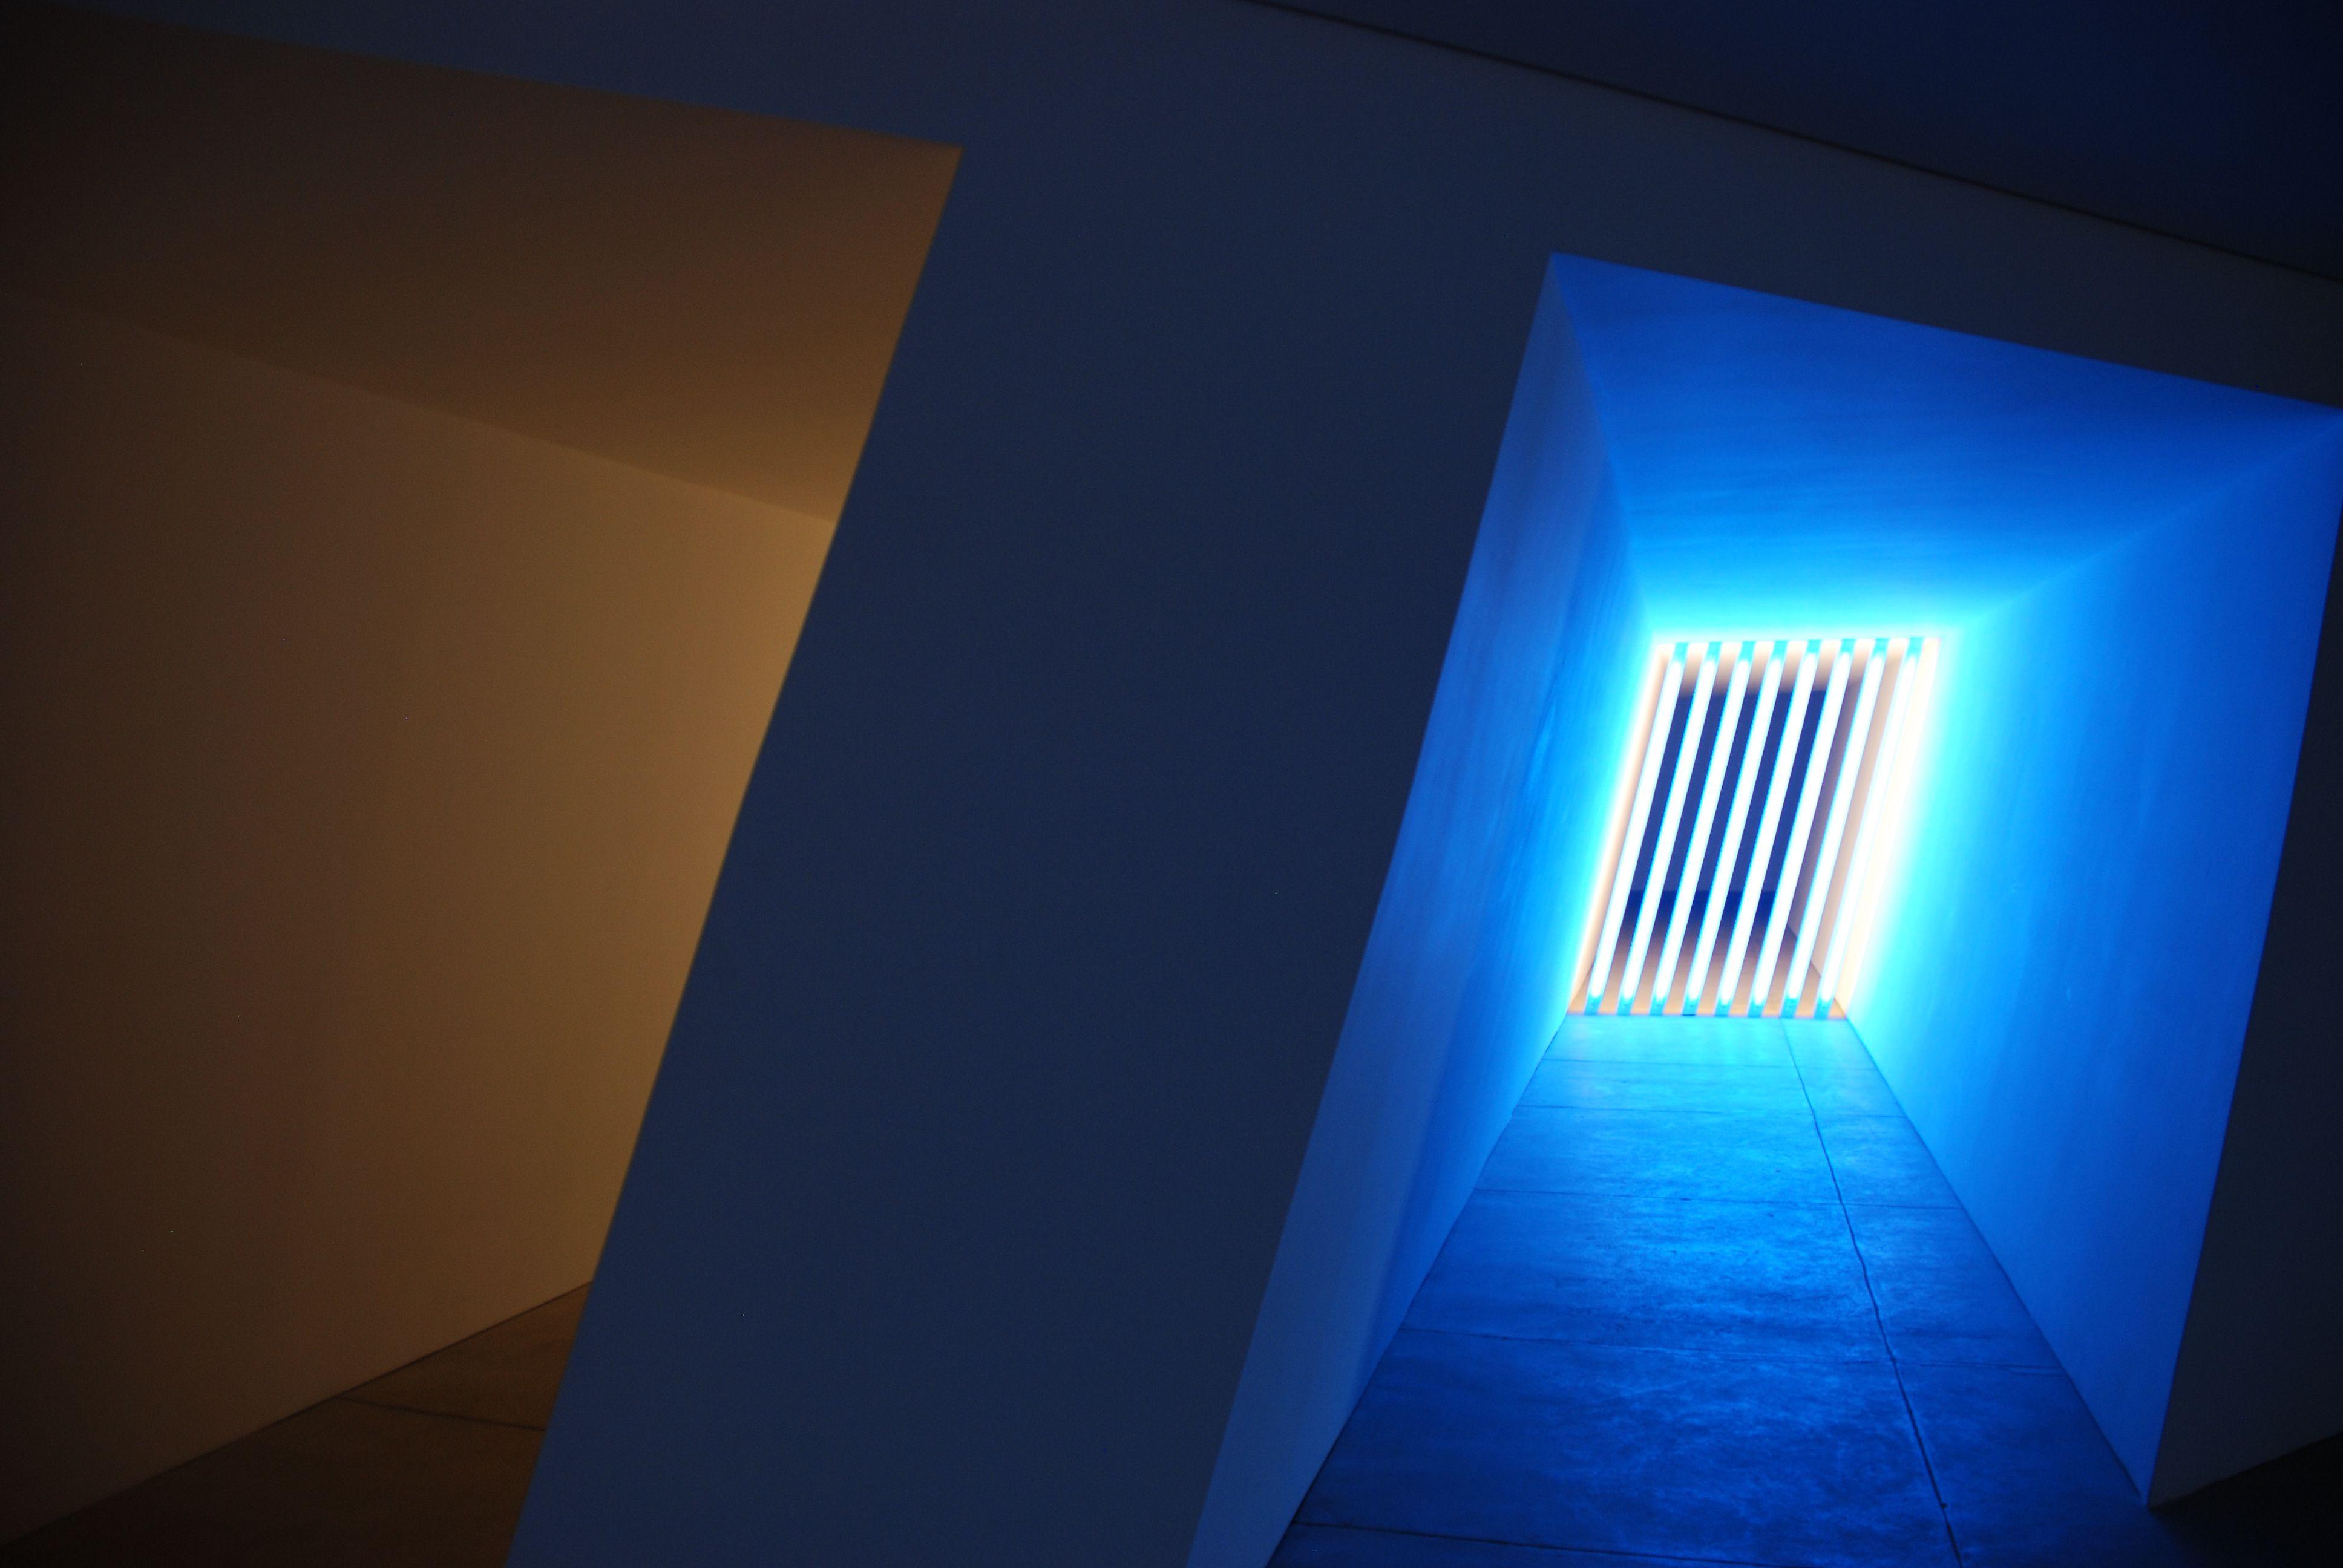 Part of the Dan Flavin Installation at the Chinati Foundation - Marfa.